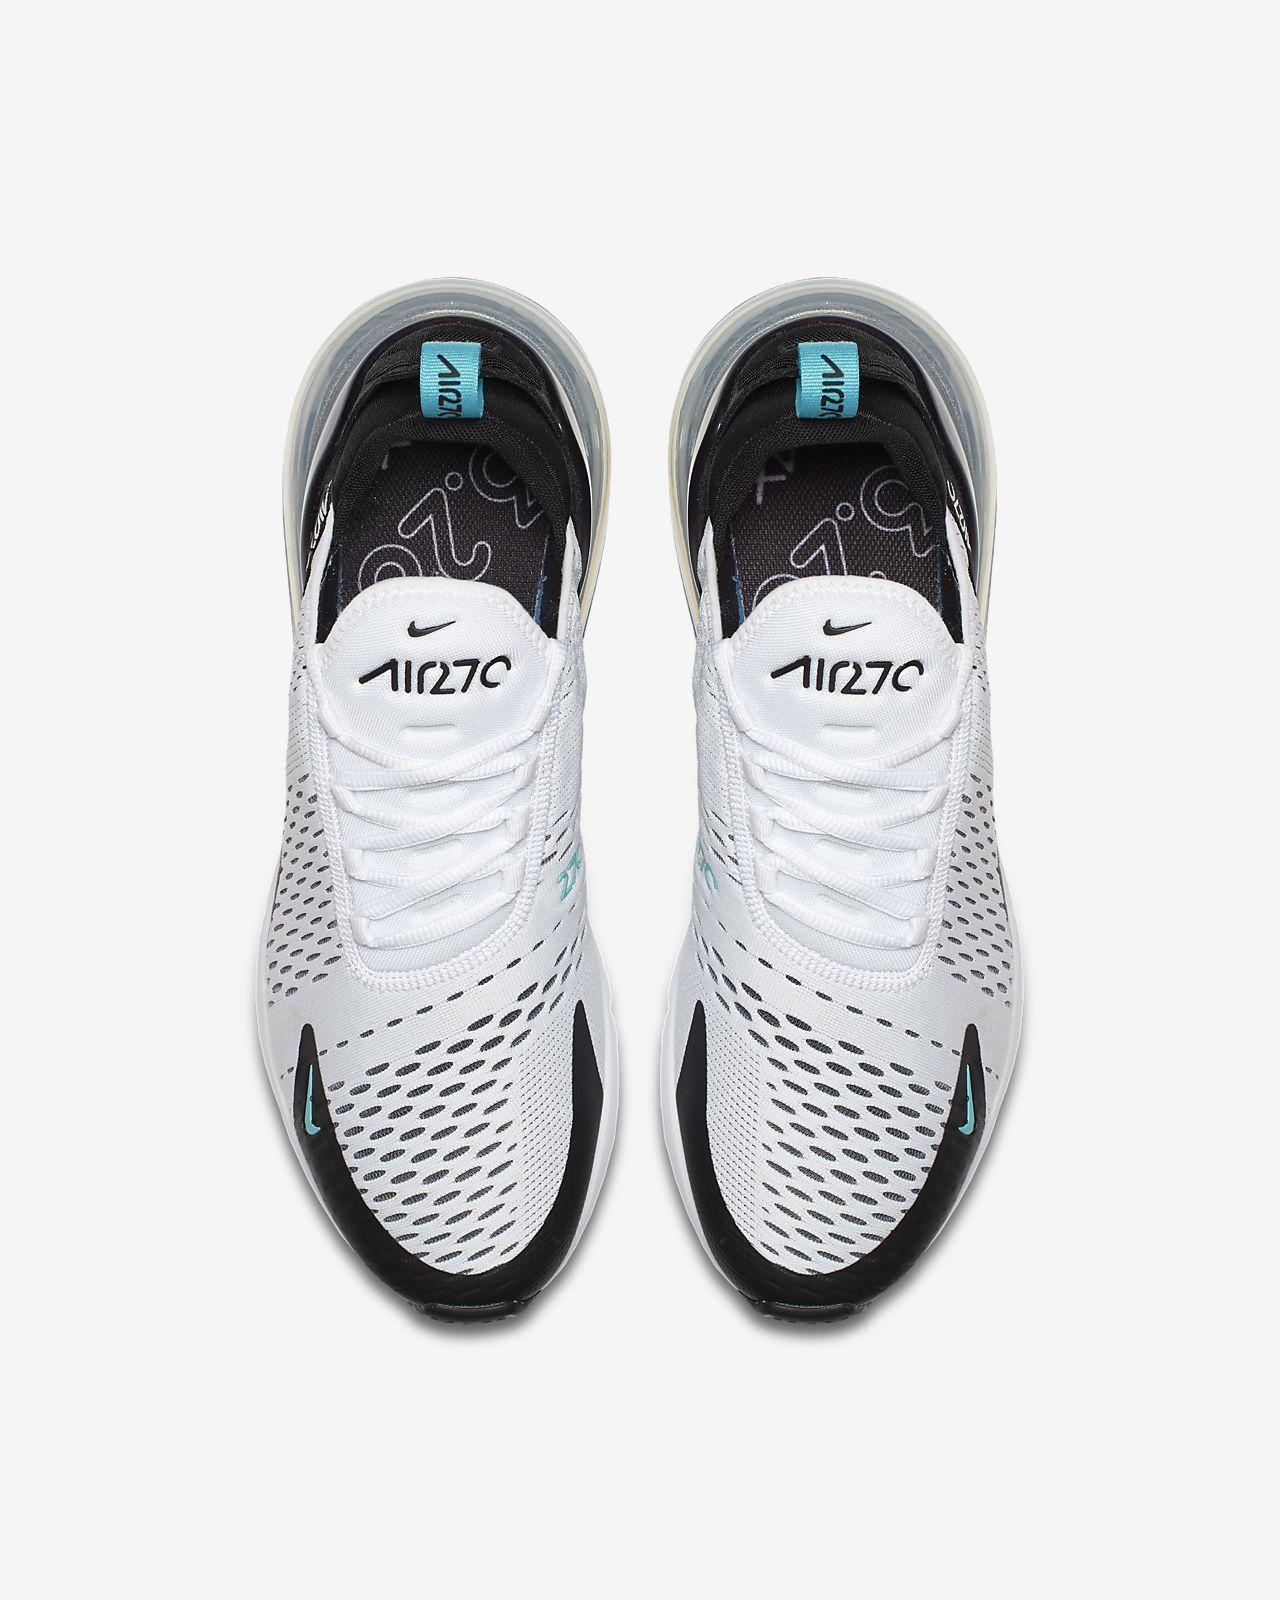 Nike Air Max 270 Dusty Cactus | AH8050 001 |